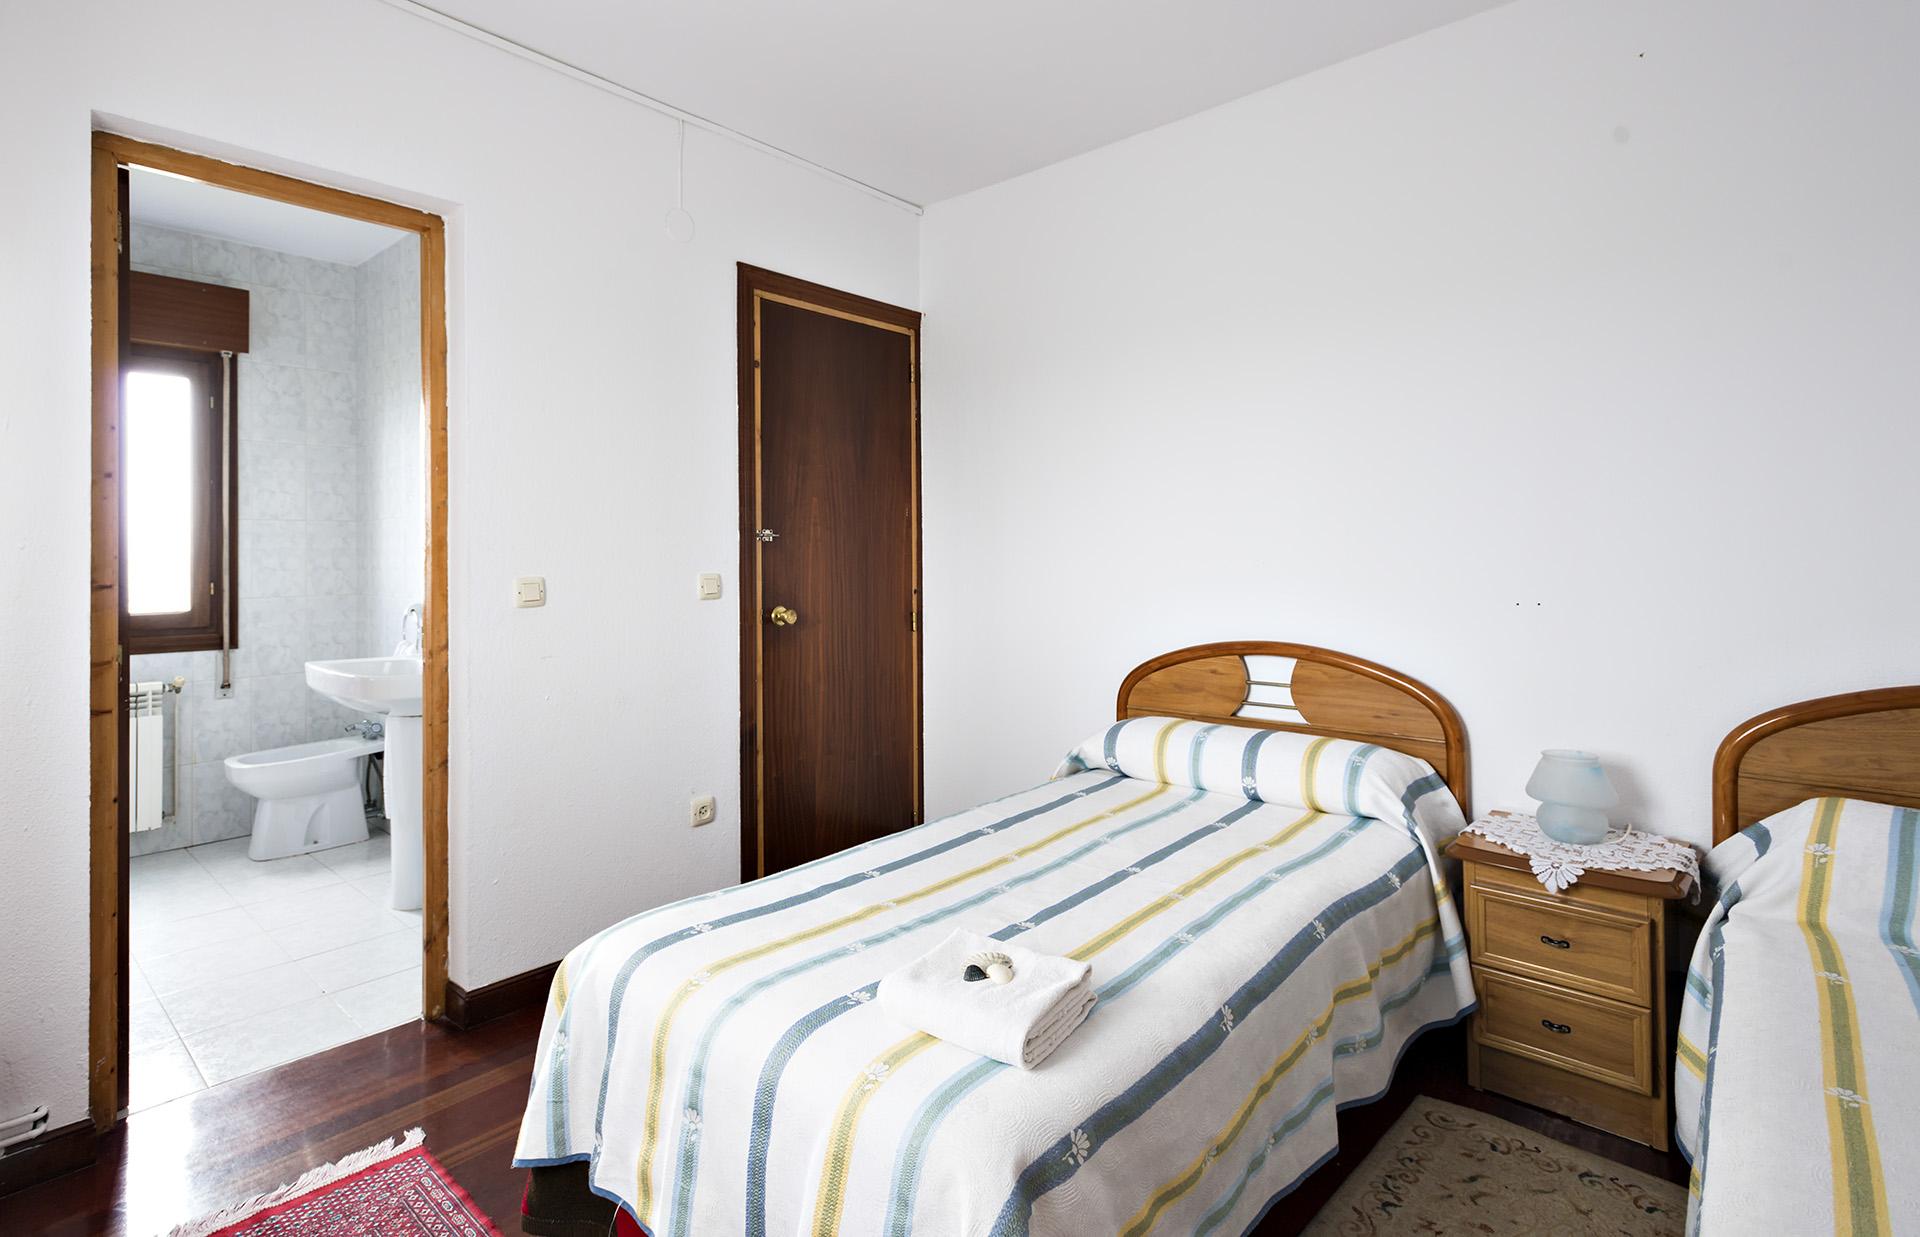 Surfhouse somo and loredo rooms